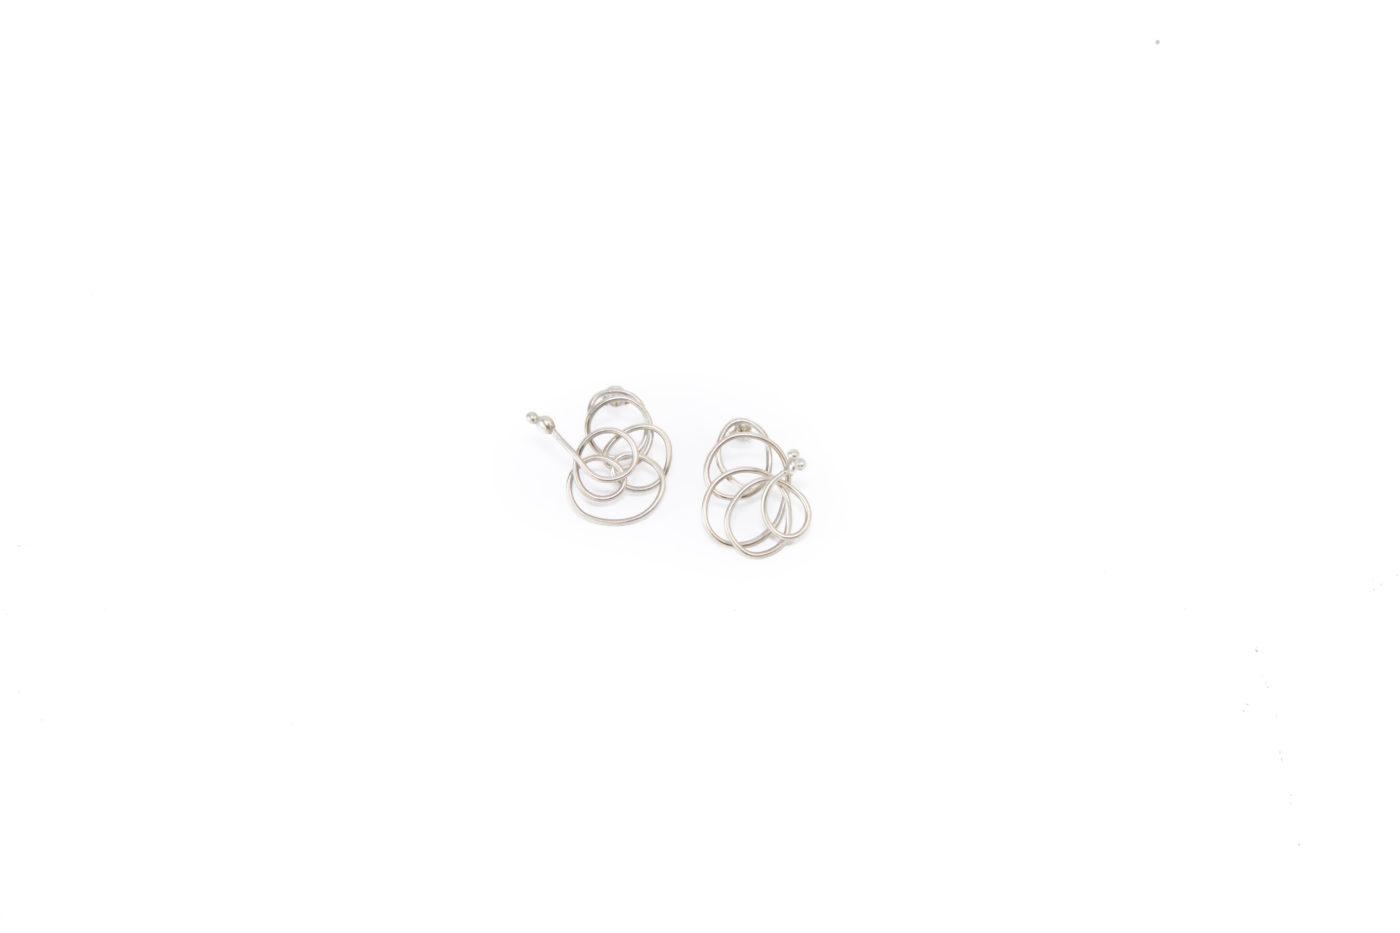 tangled earrings, sterling silver, abstract earrings, everyday earrings